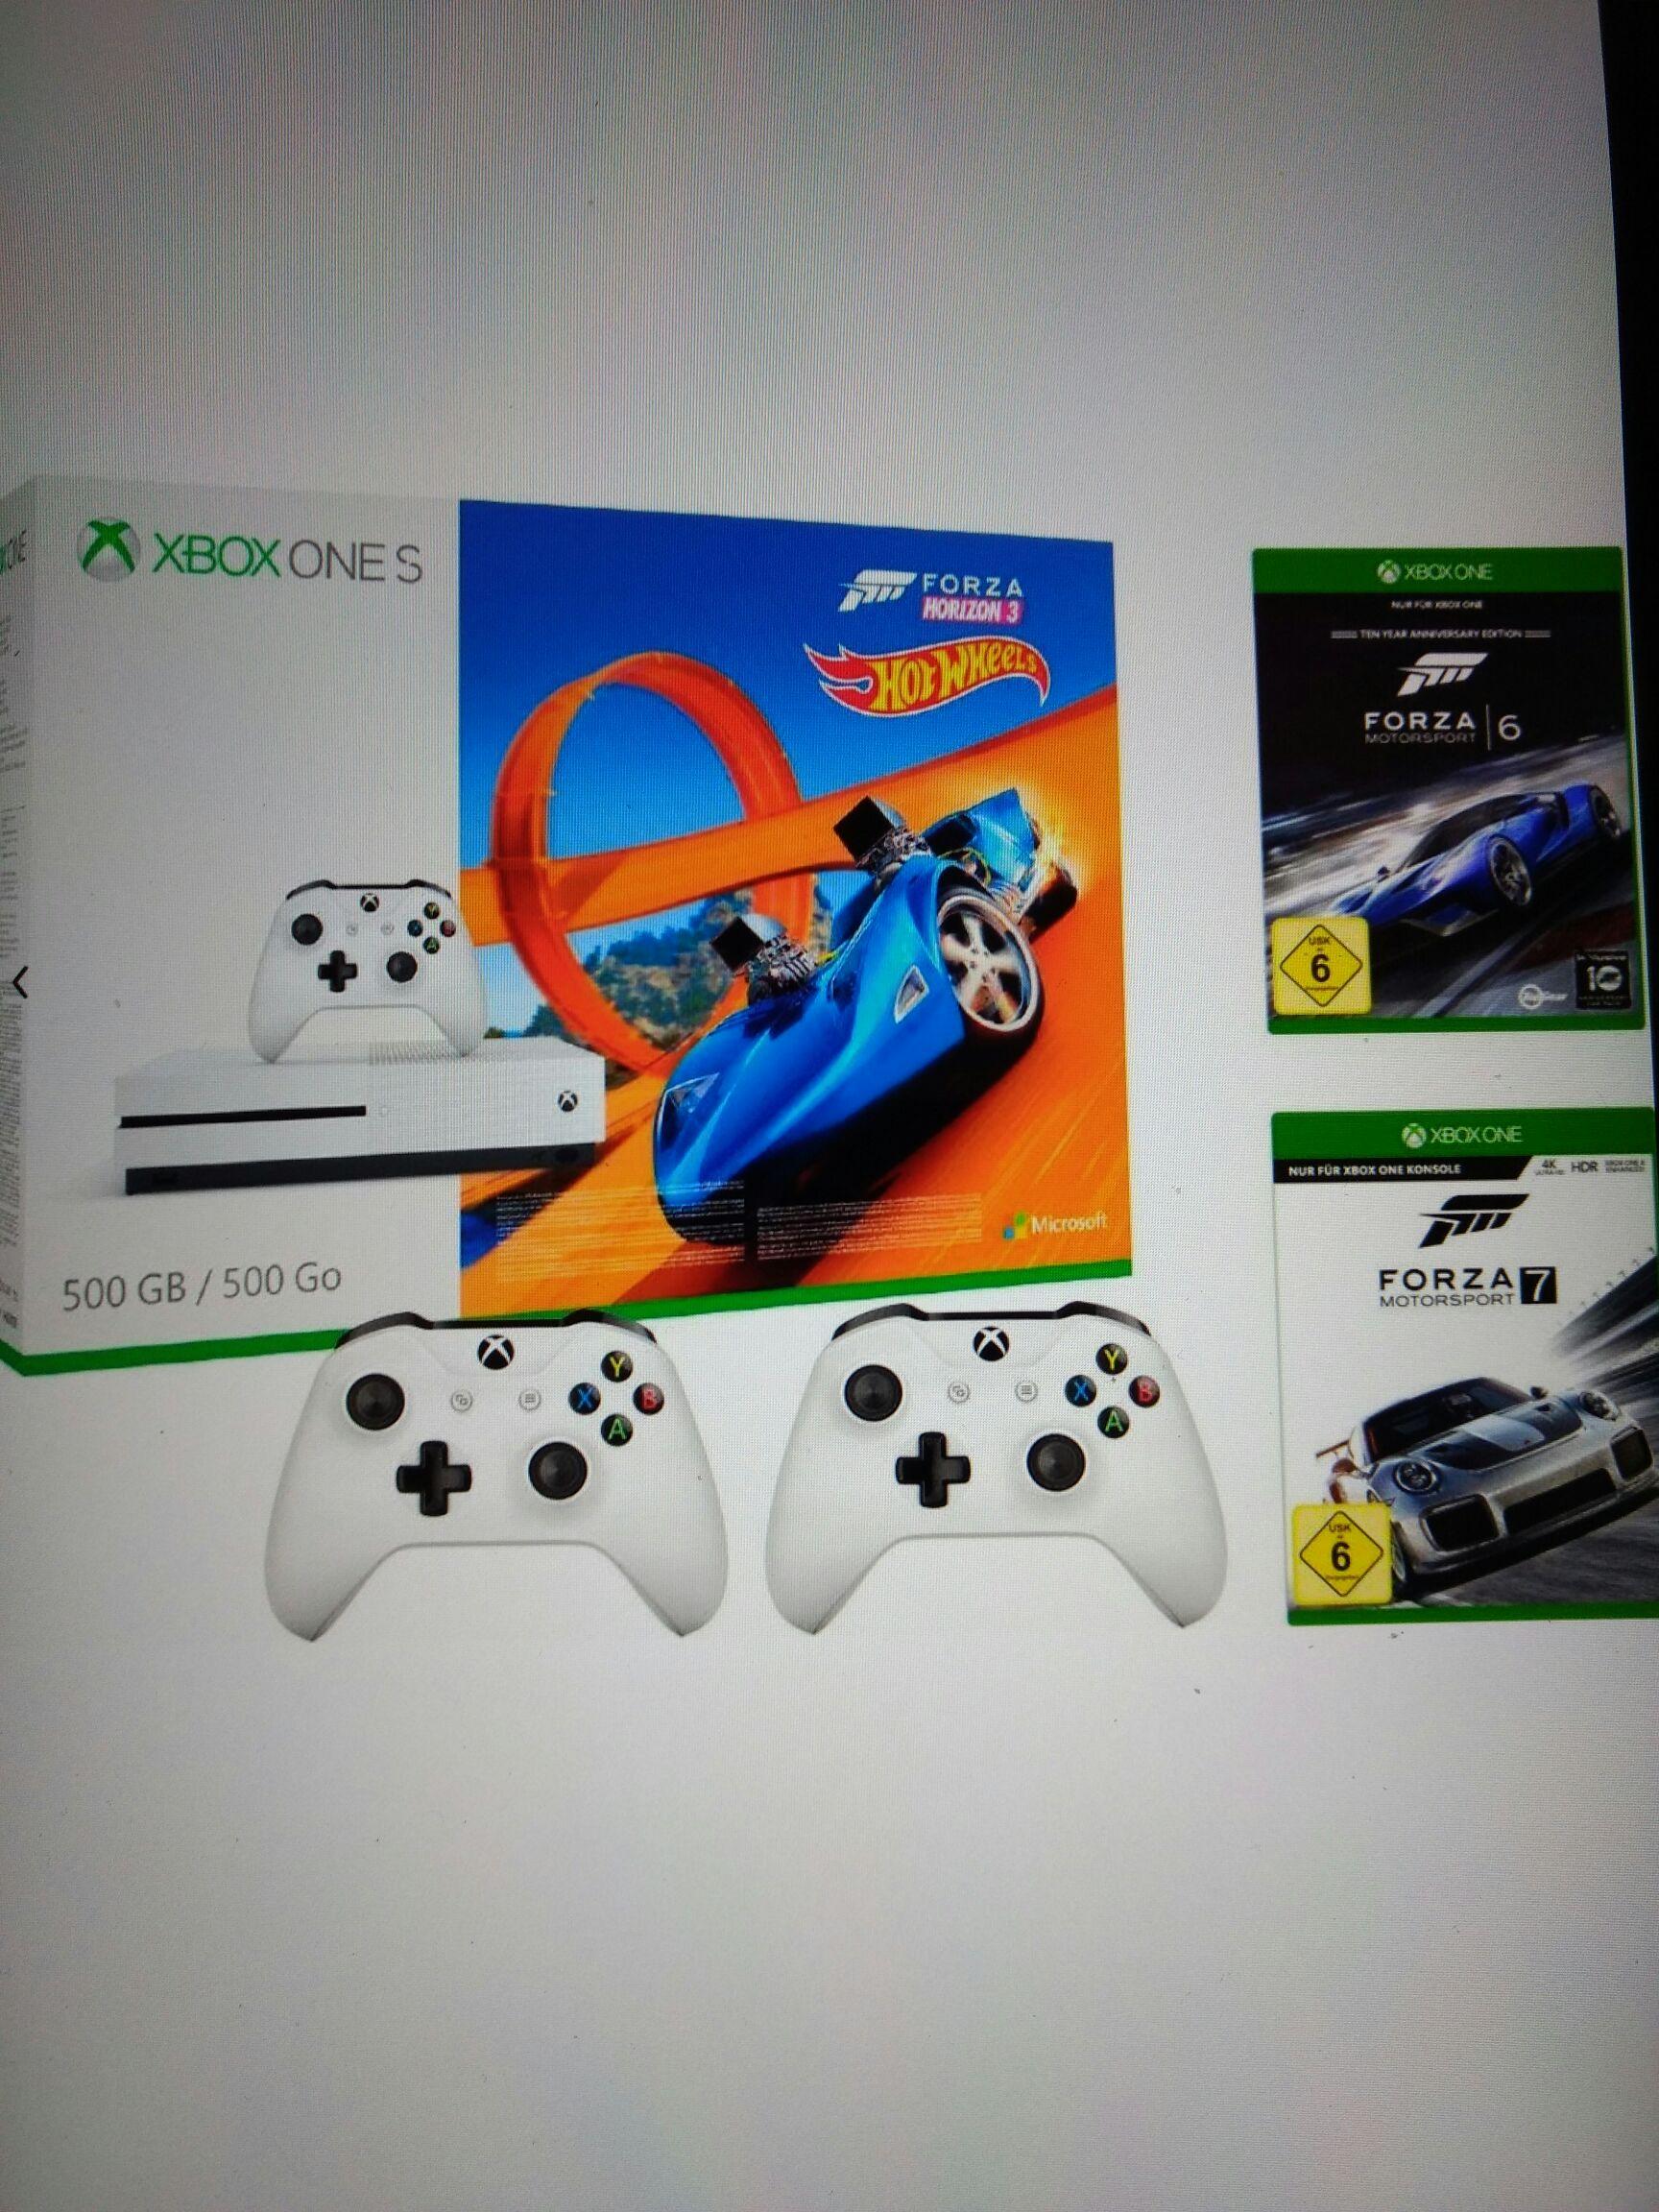 Xbox One S 500 GB + Forza Horizon 3 (DLC) + Hot Wheels (DLC) + Forza 6 + Forza 7 + 2. Controller